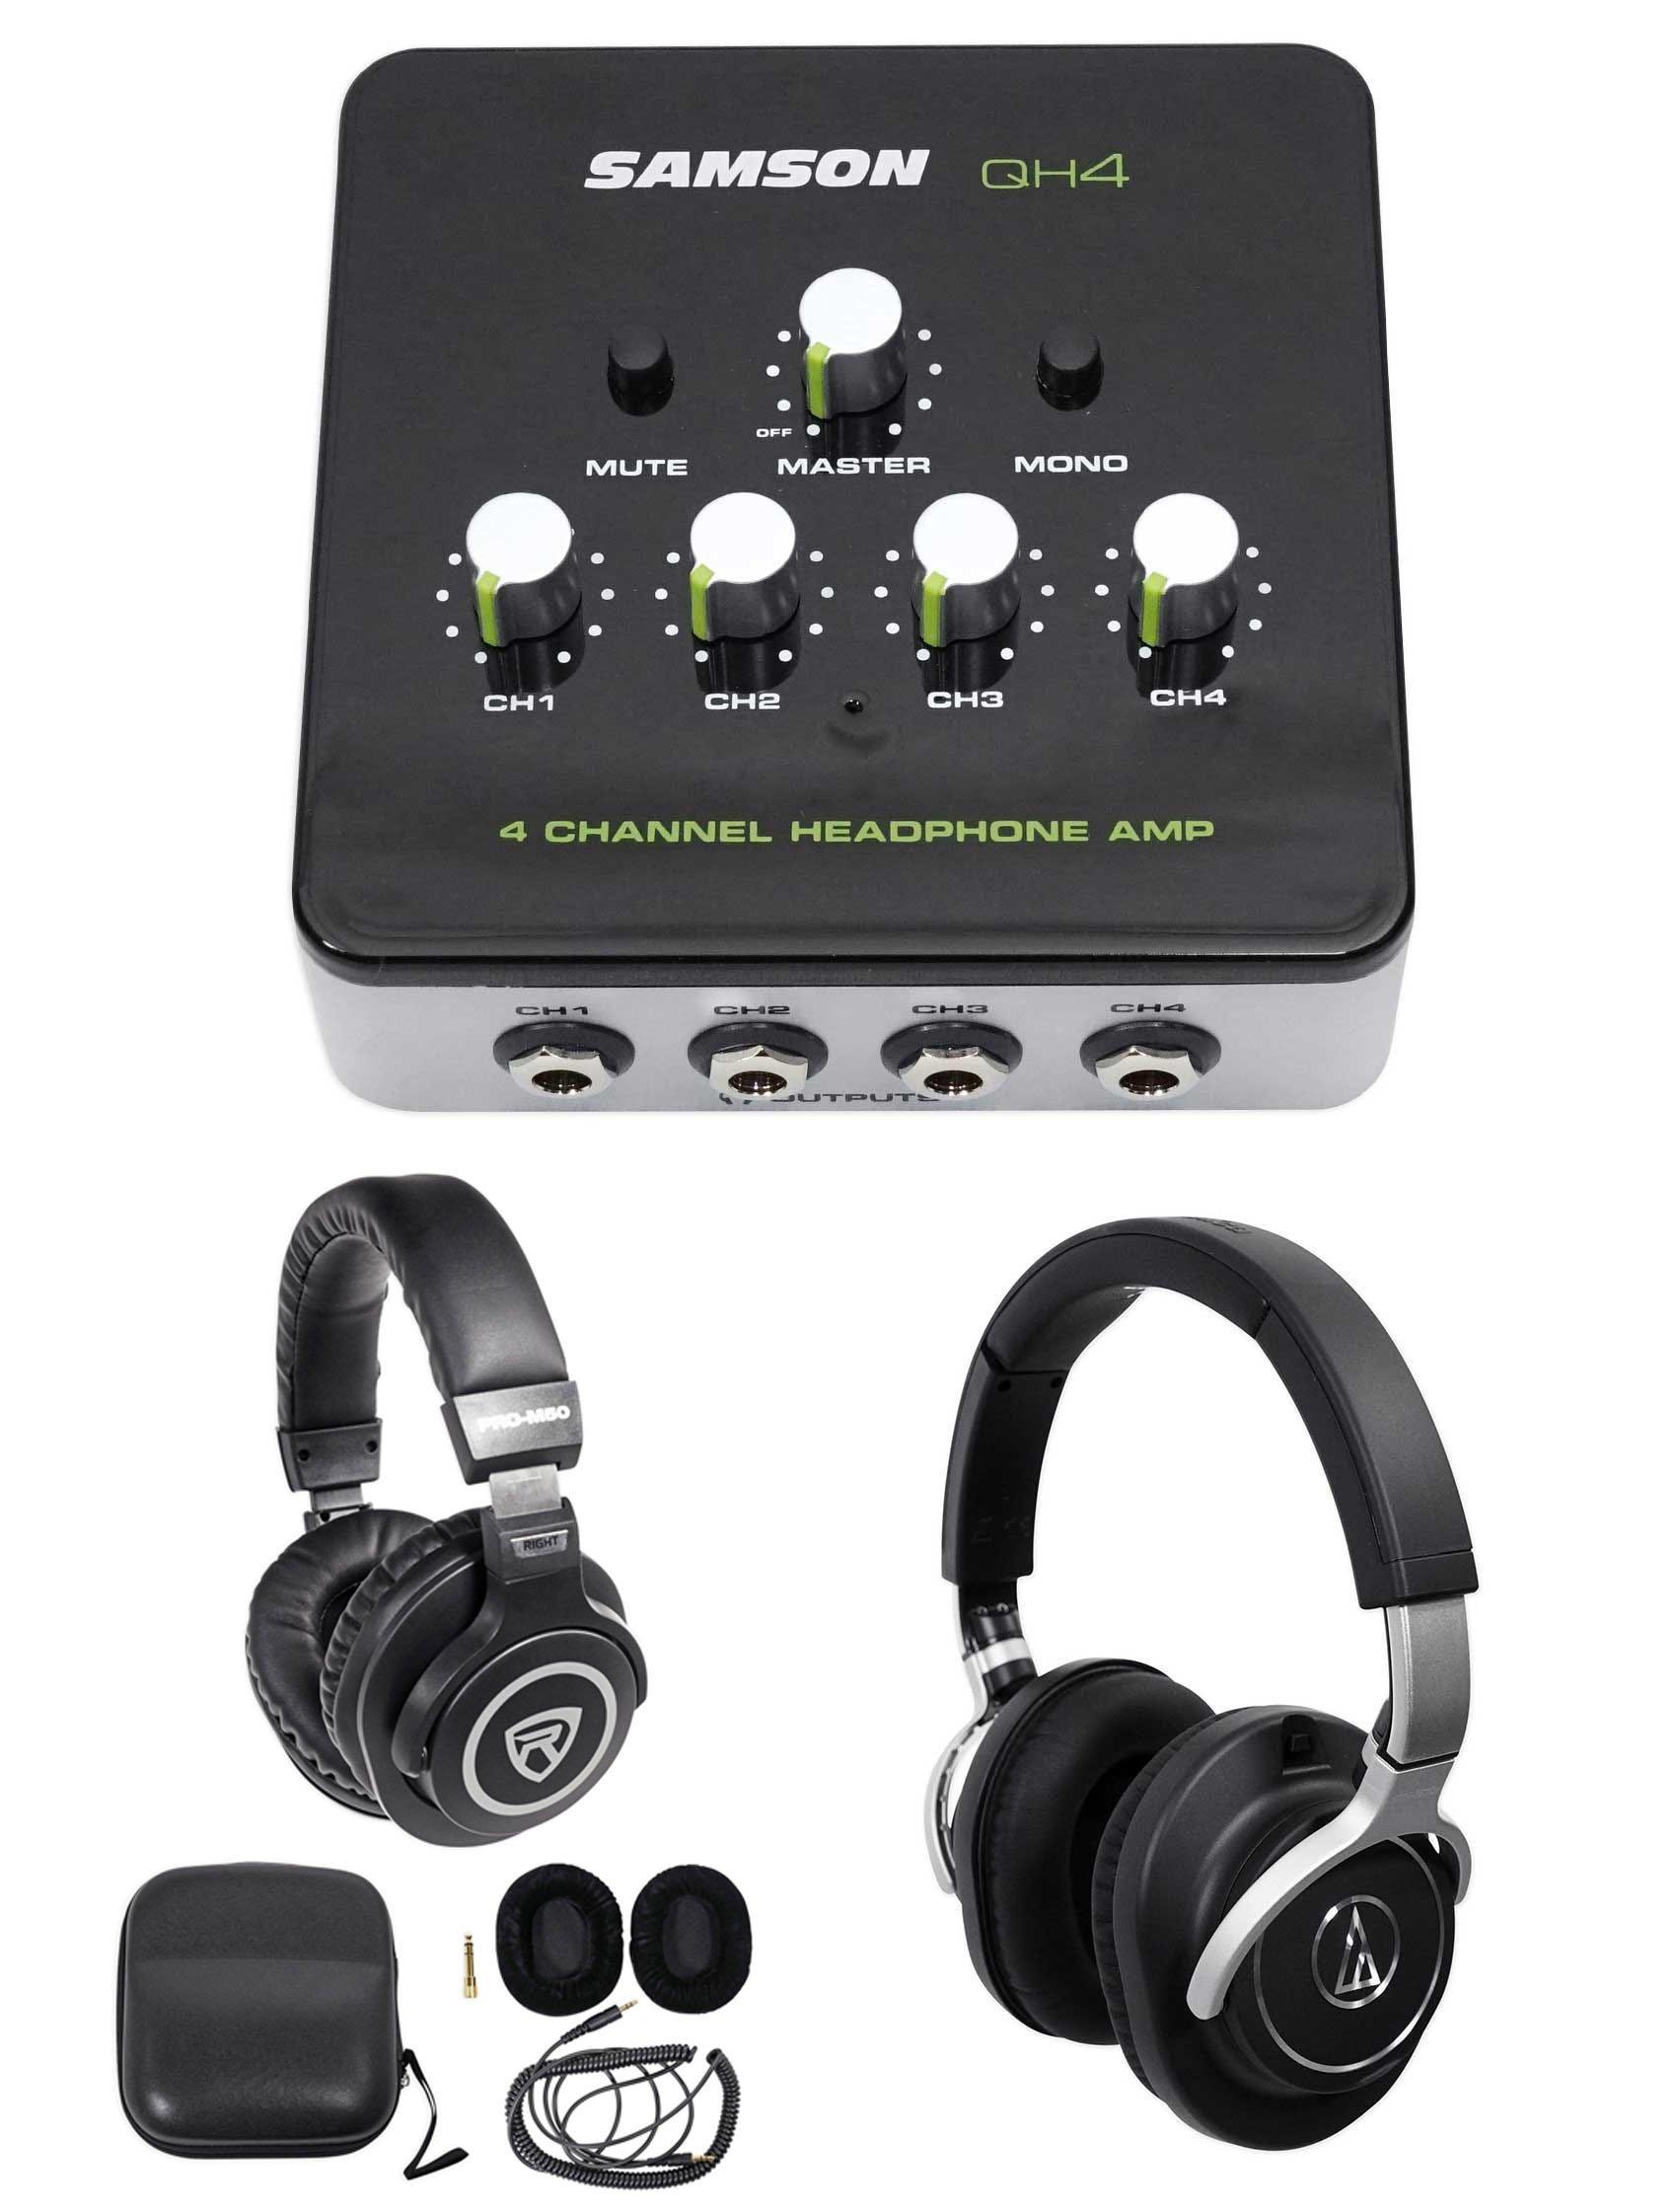 Audio Technica ATH-M70x Pro Monitor Headphones ATHM70x+Amplifier+Free Headphones